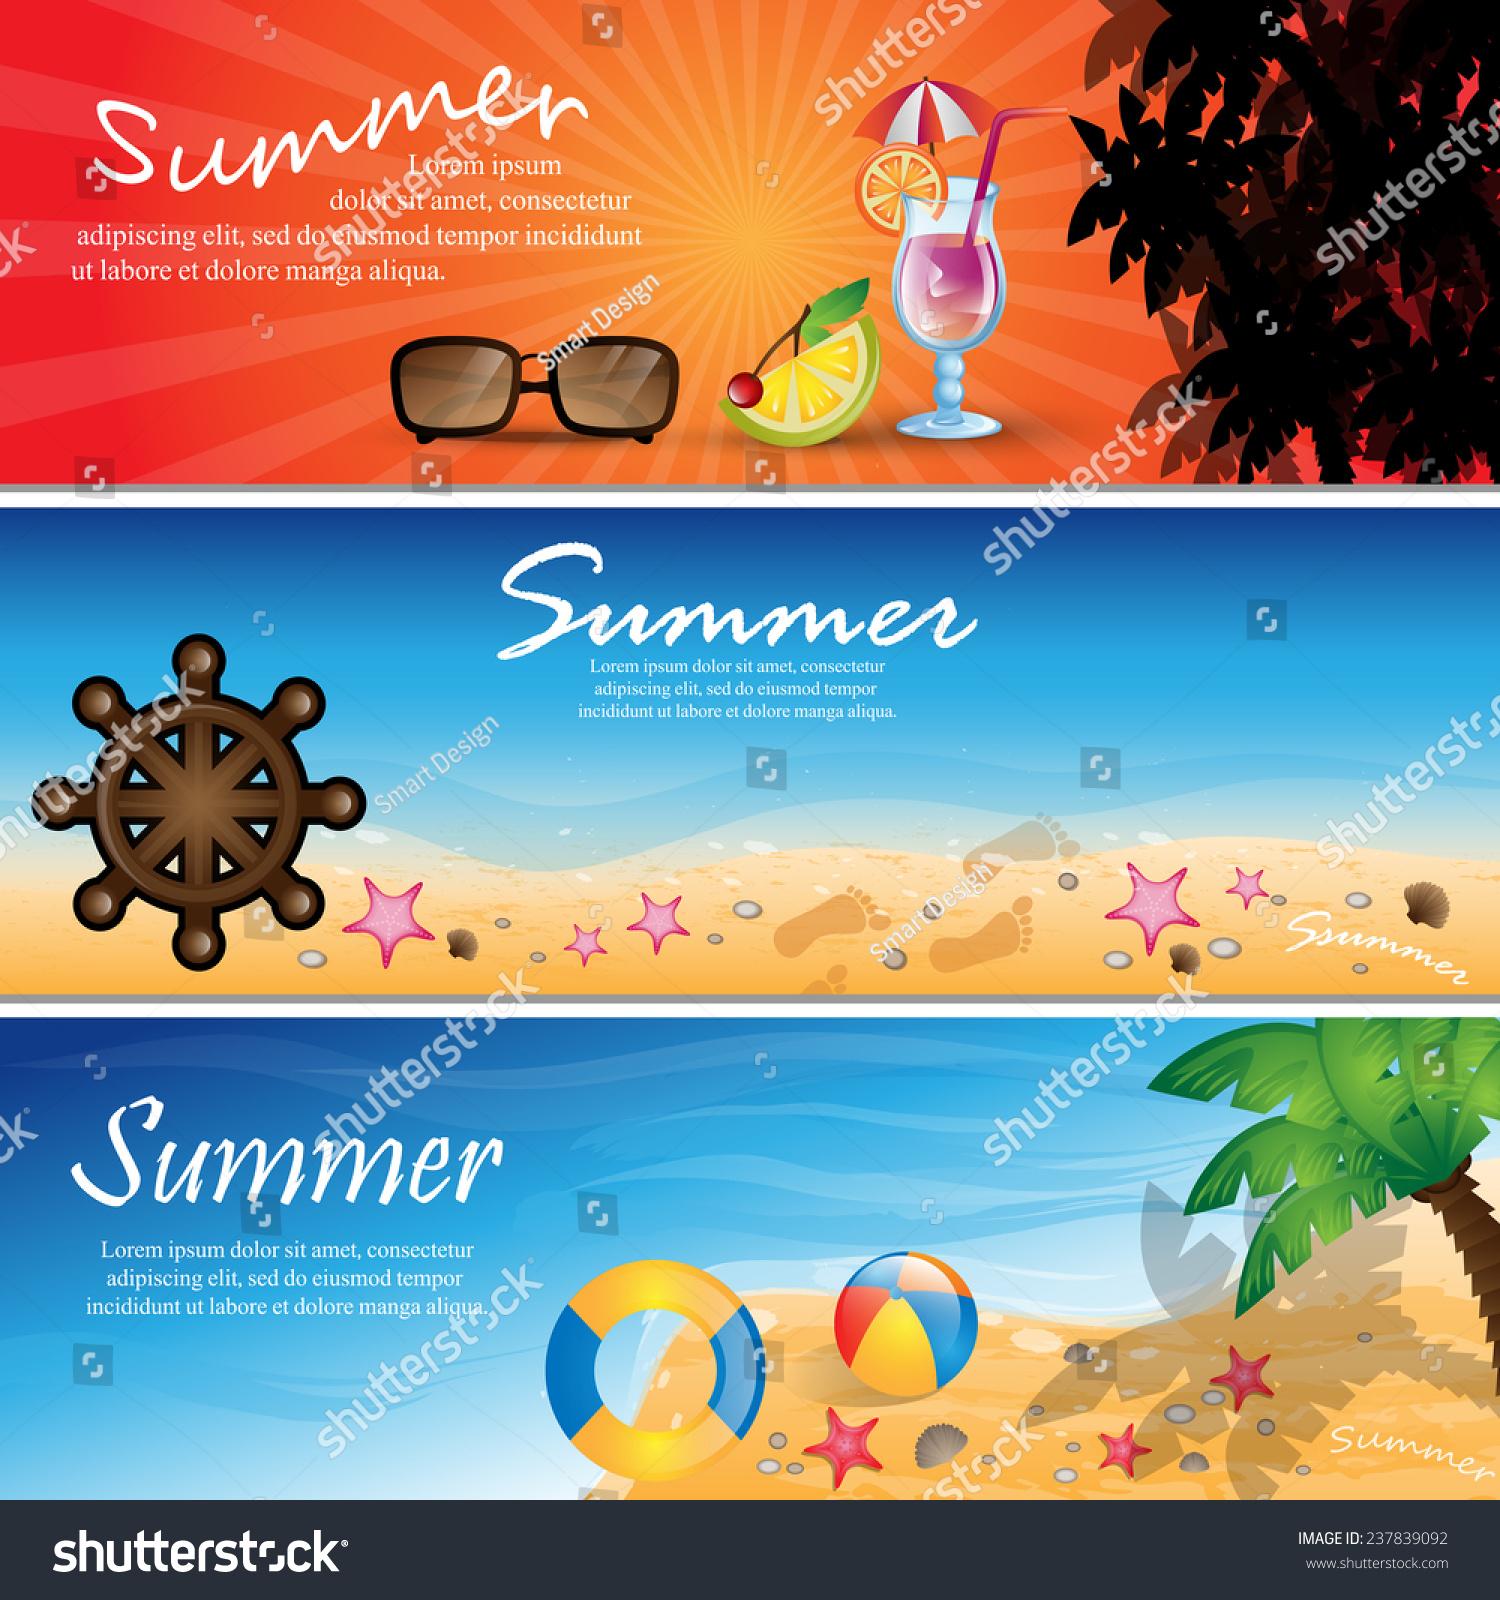 Summer Flyer Template   Vector Illustration, Graphic Design, Editable For  Your Design